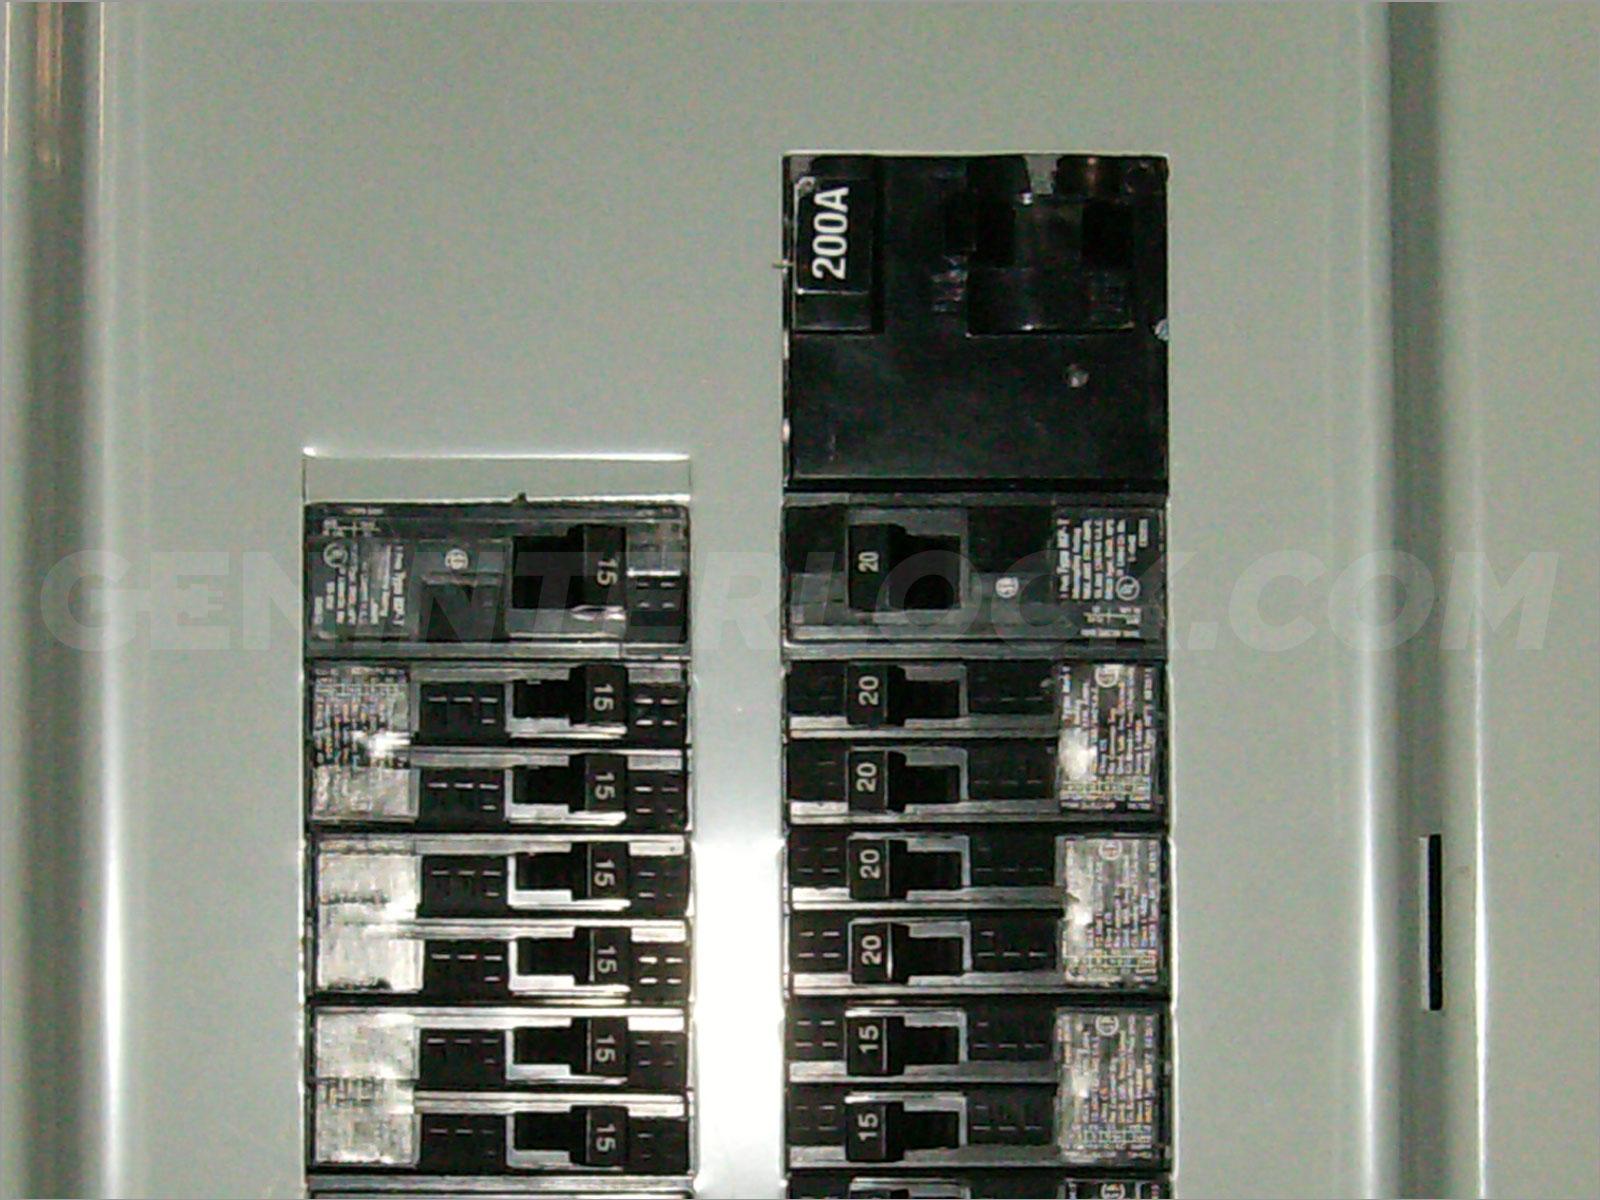 siemens home generators images siemens transfer switch kit